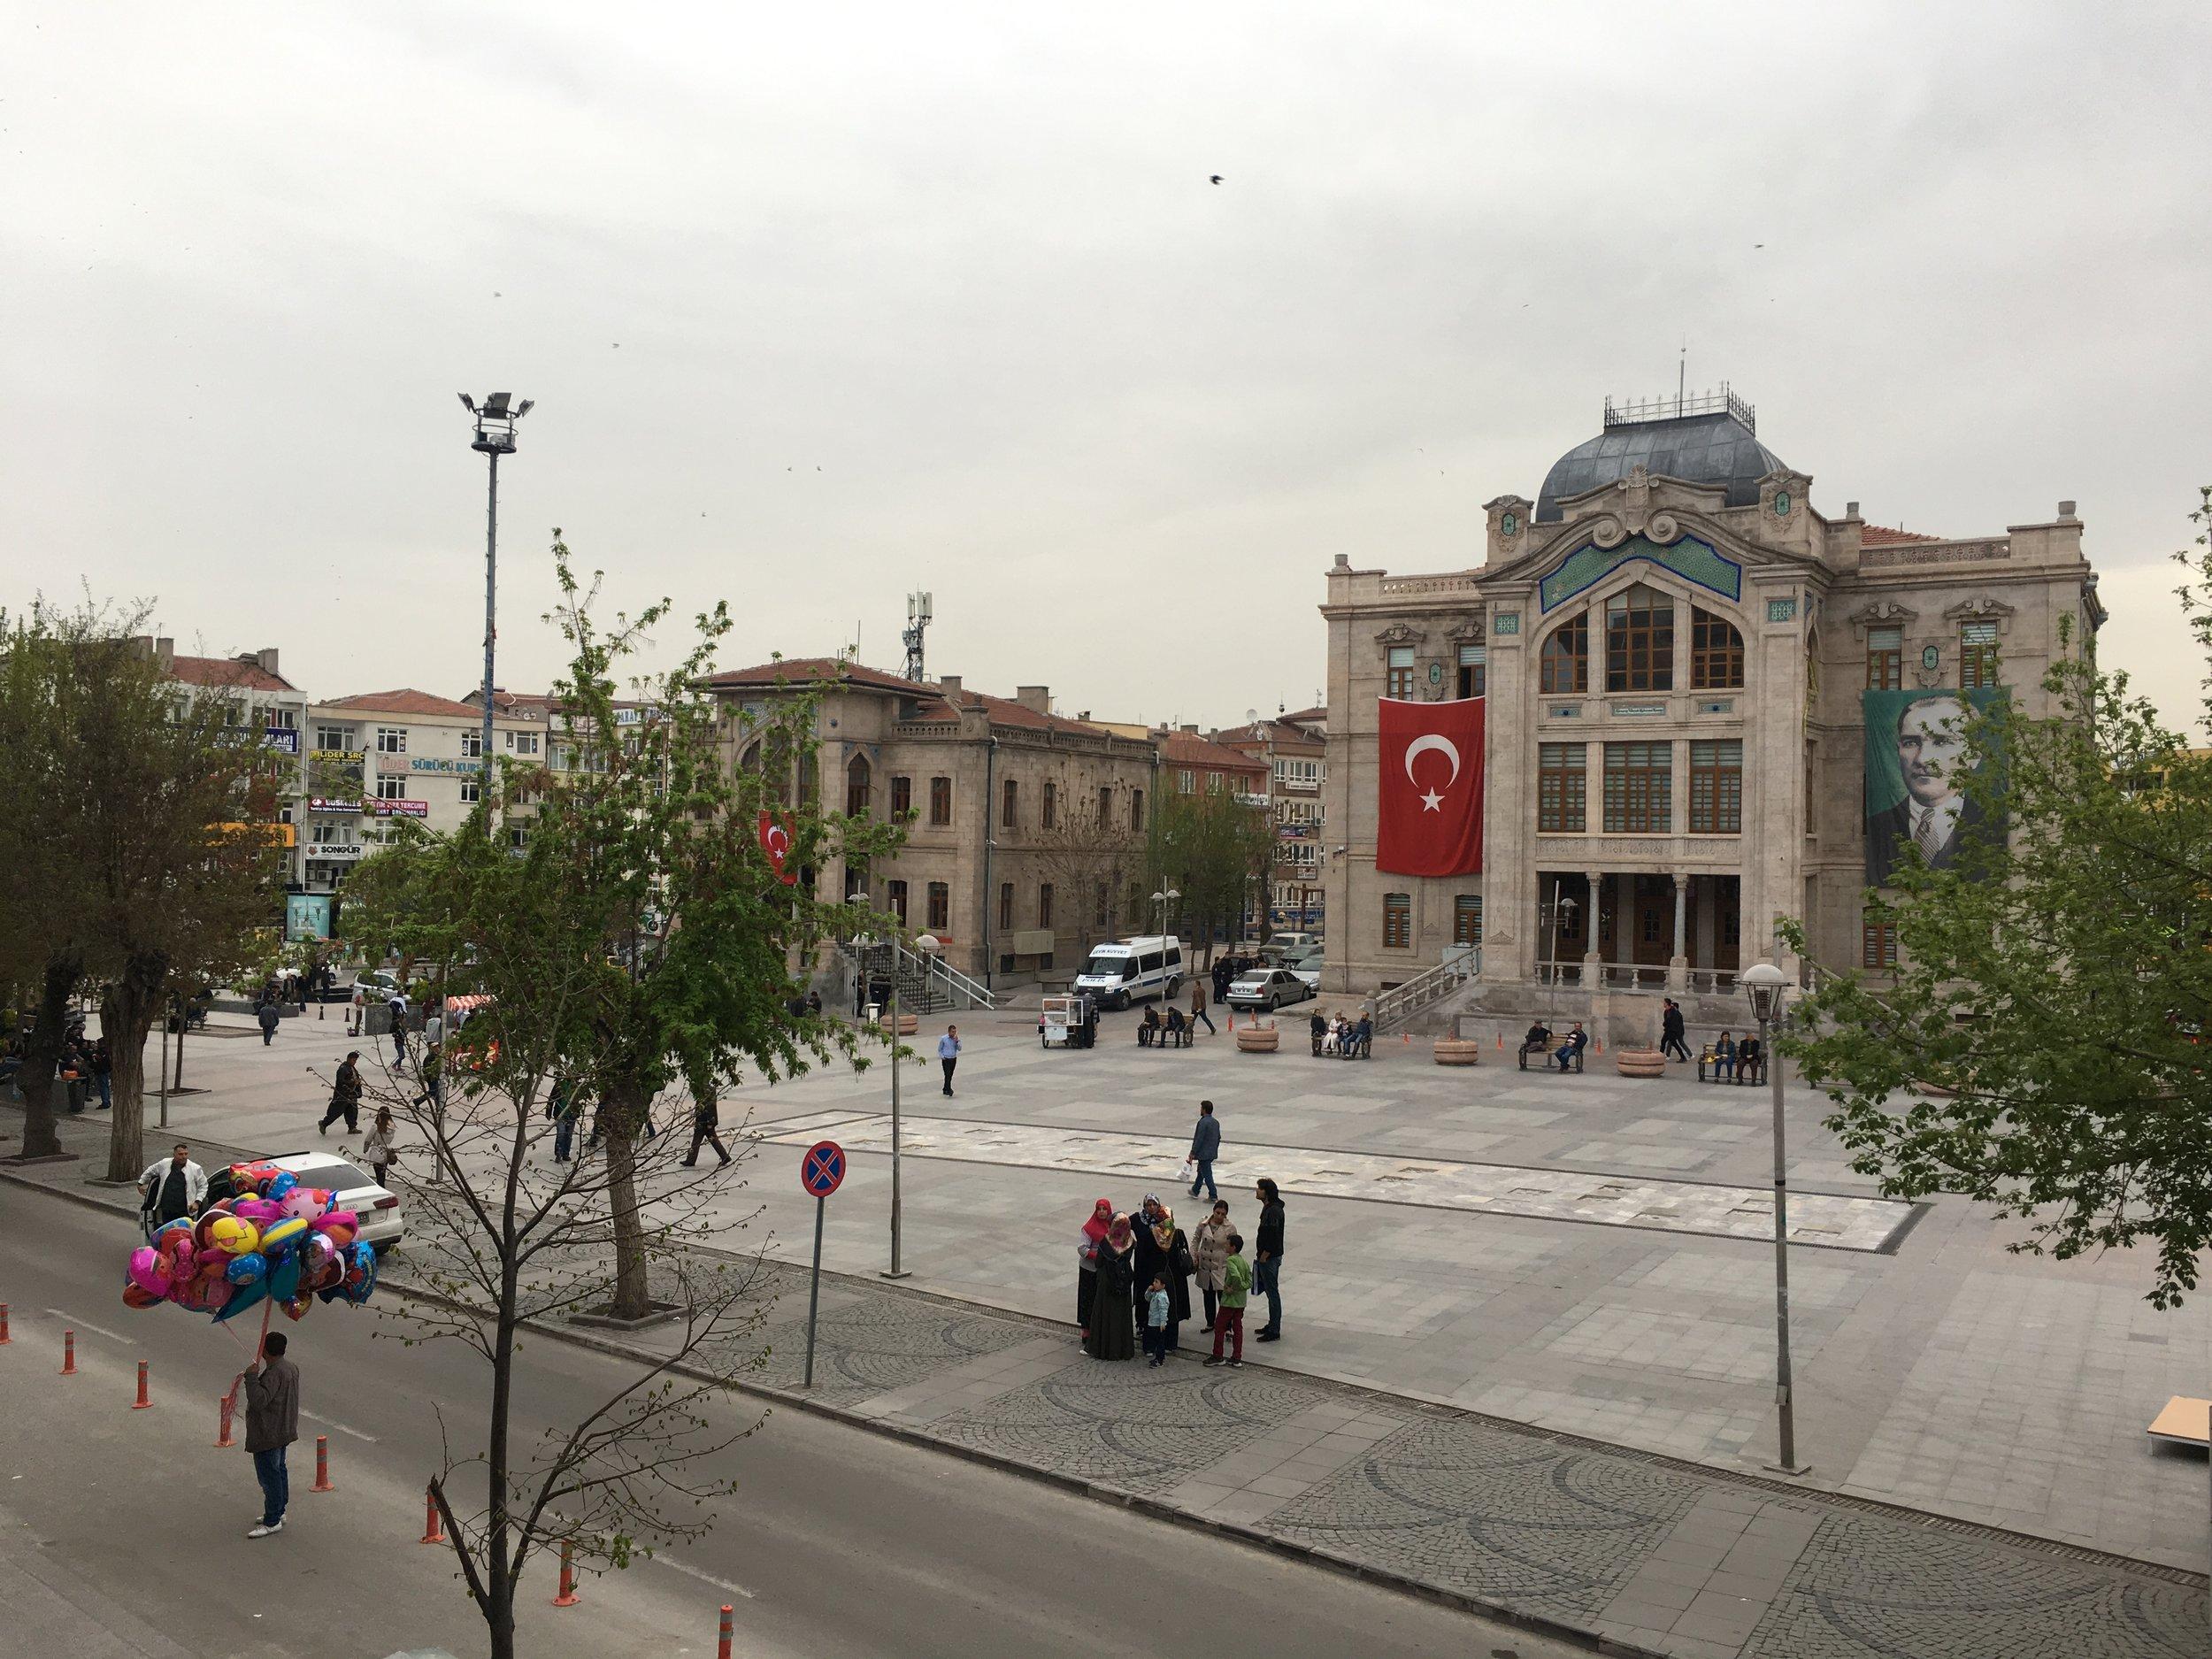 Aksaray's main square.